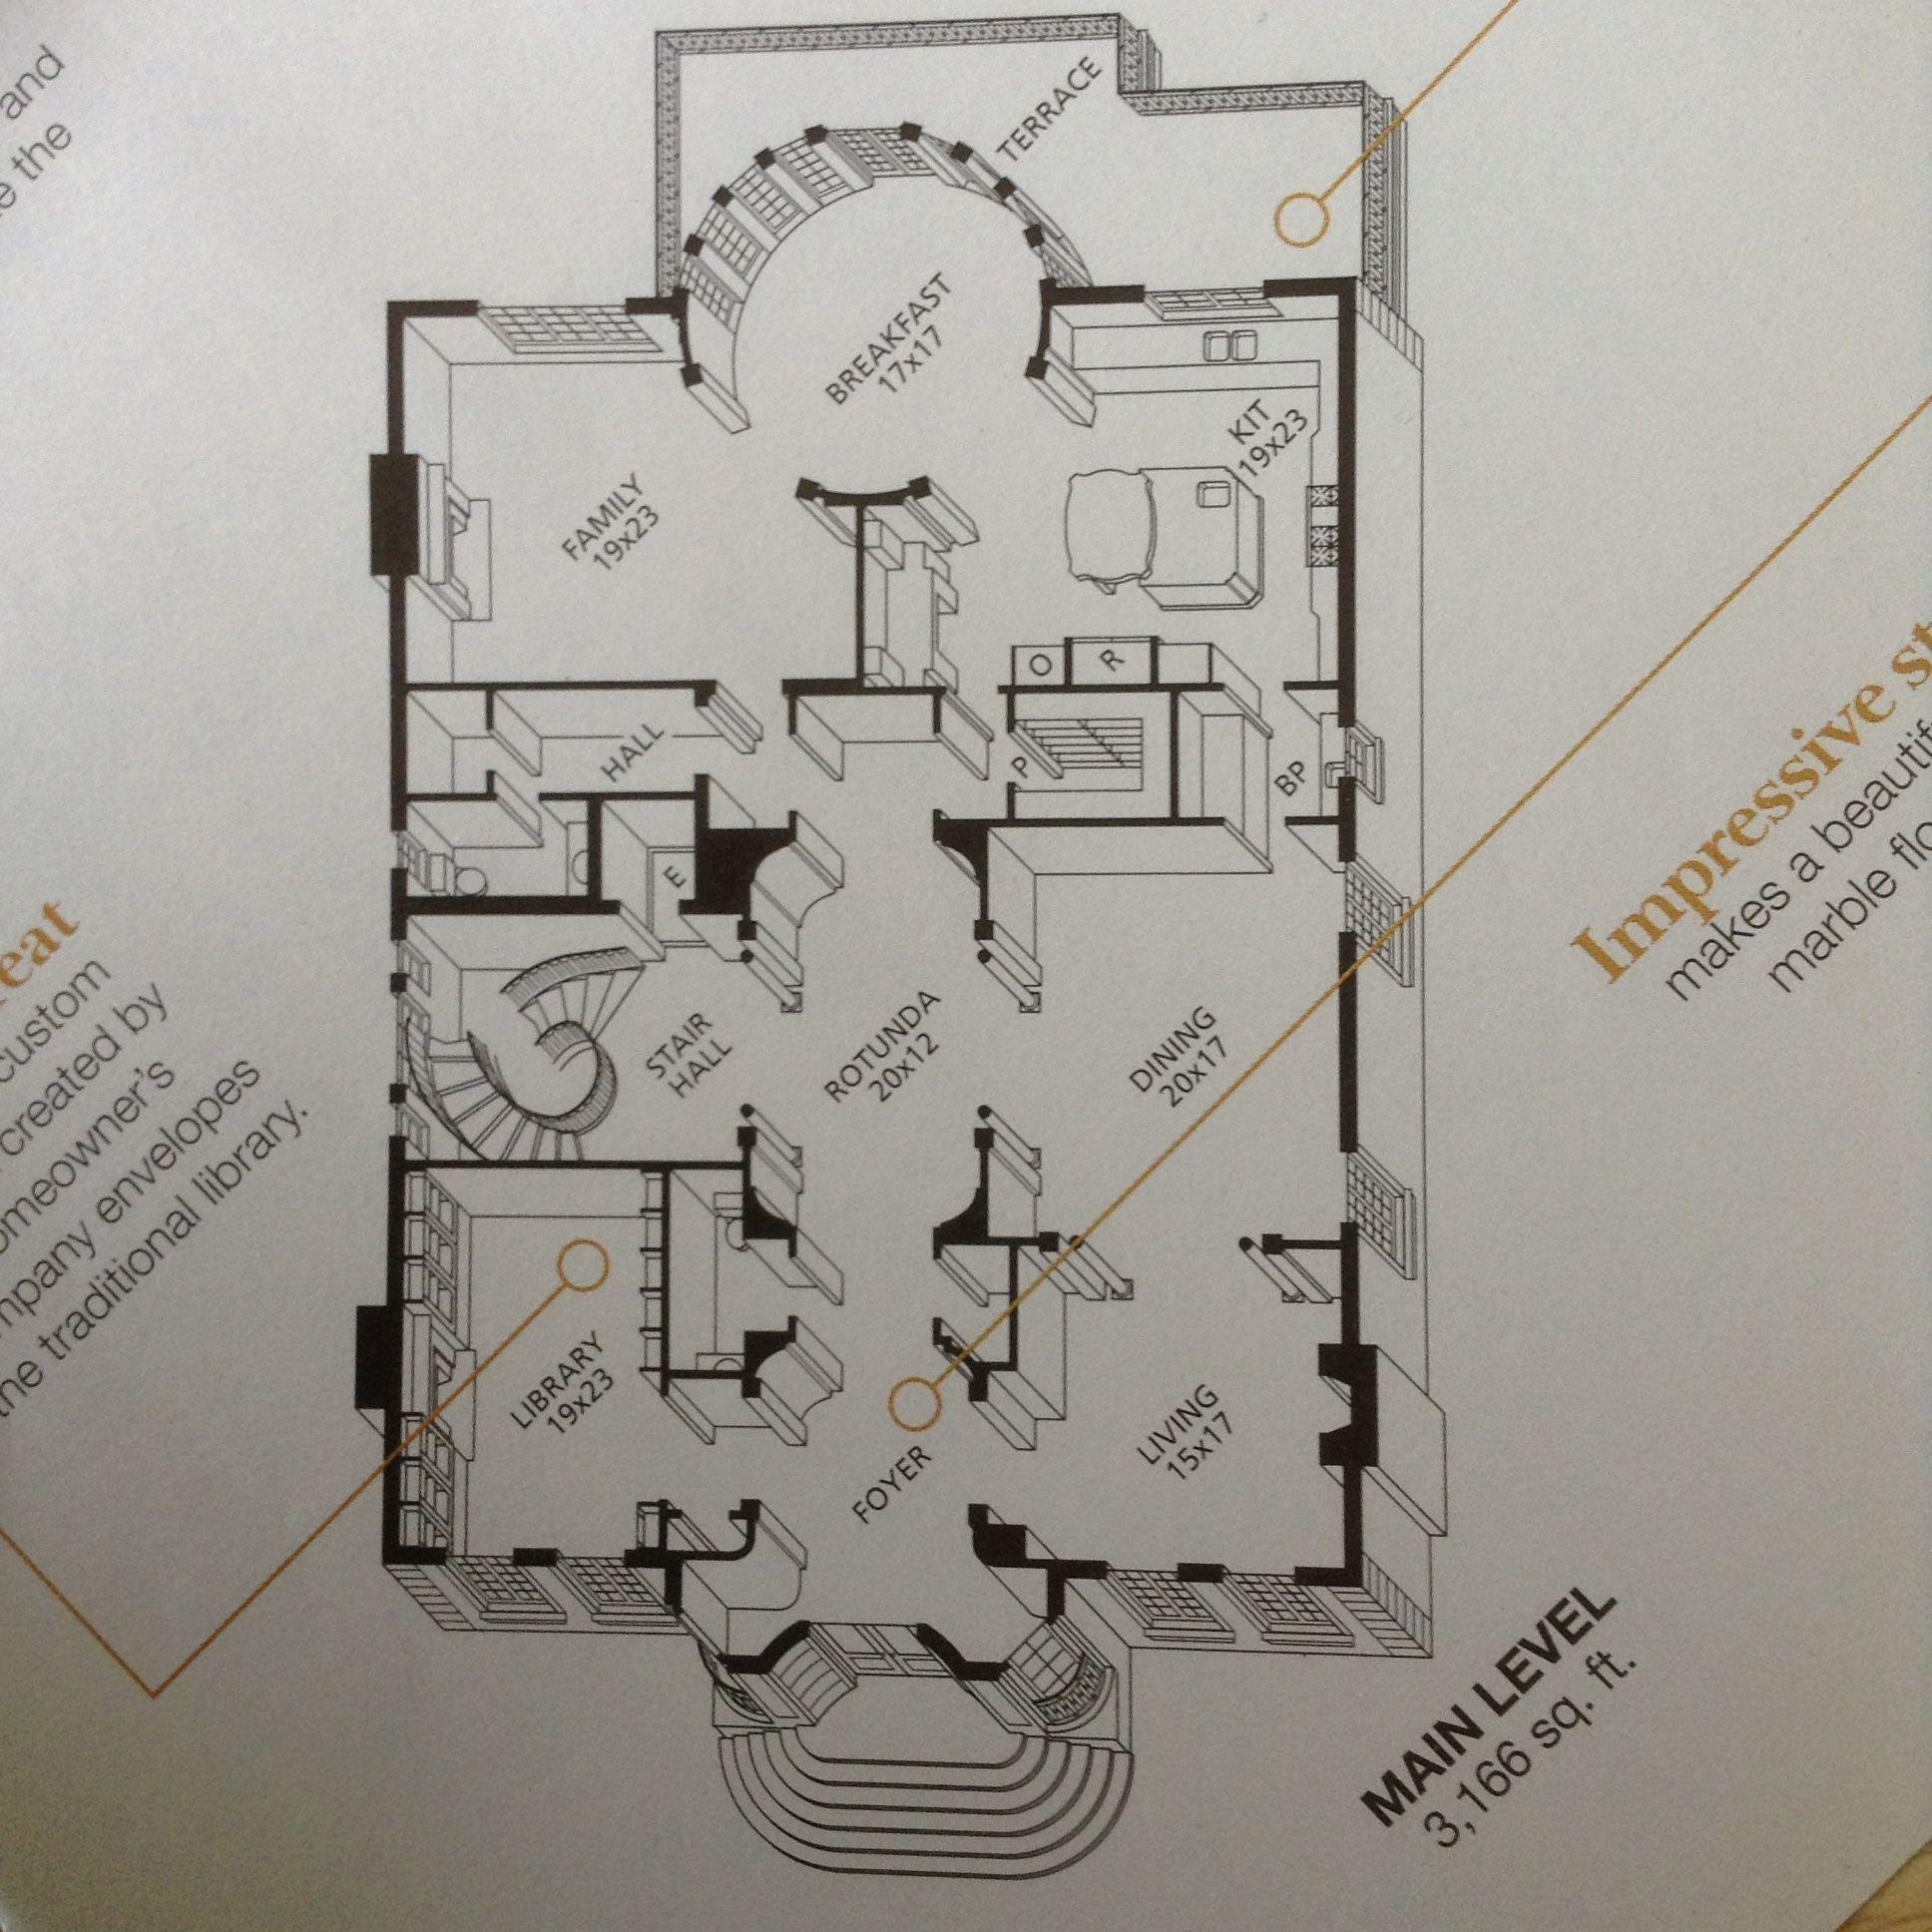 Toronto Area Philip Mitchell Design Apartment Floor Plans Craftsman Floor Plans Modern House Plans